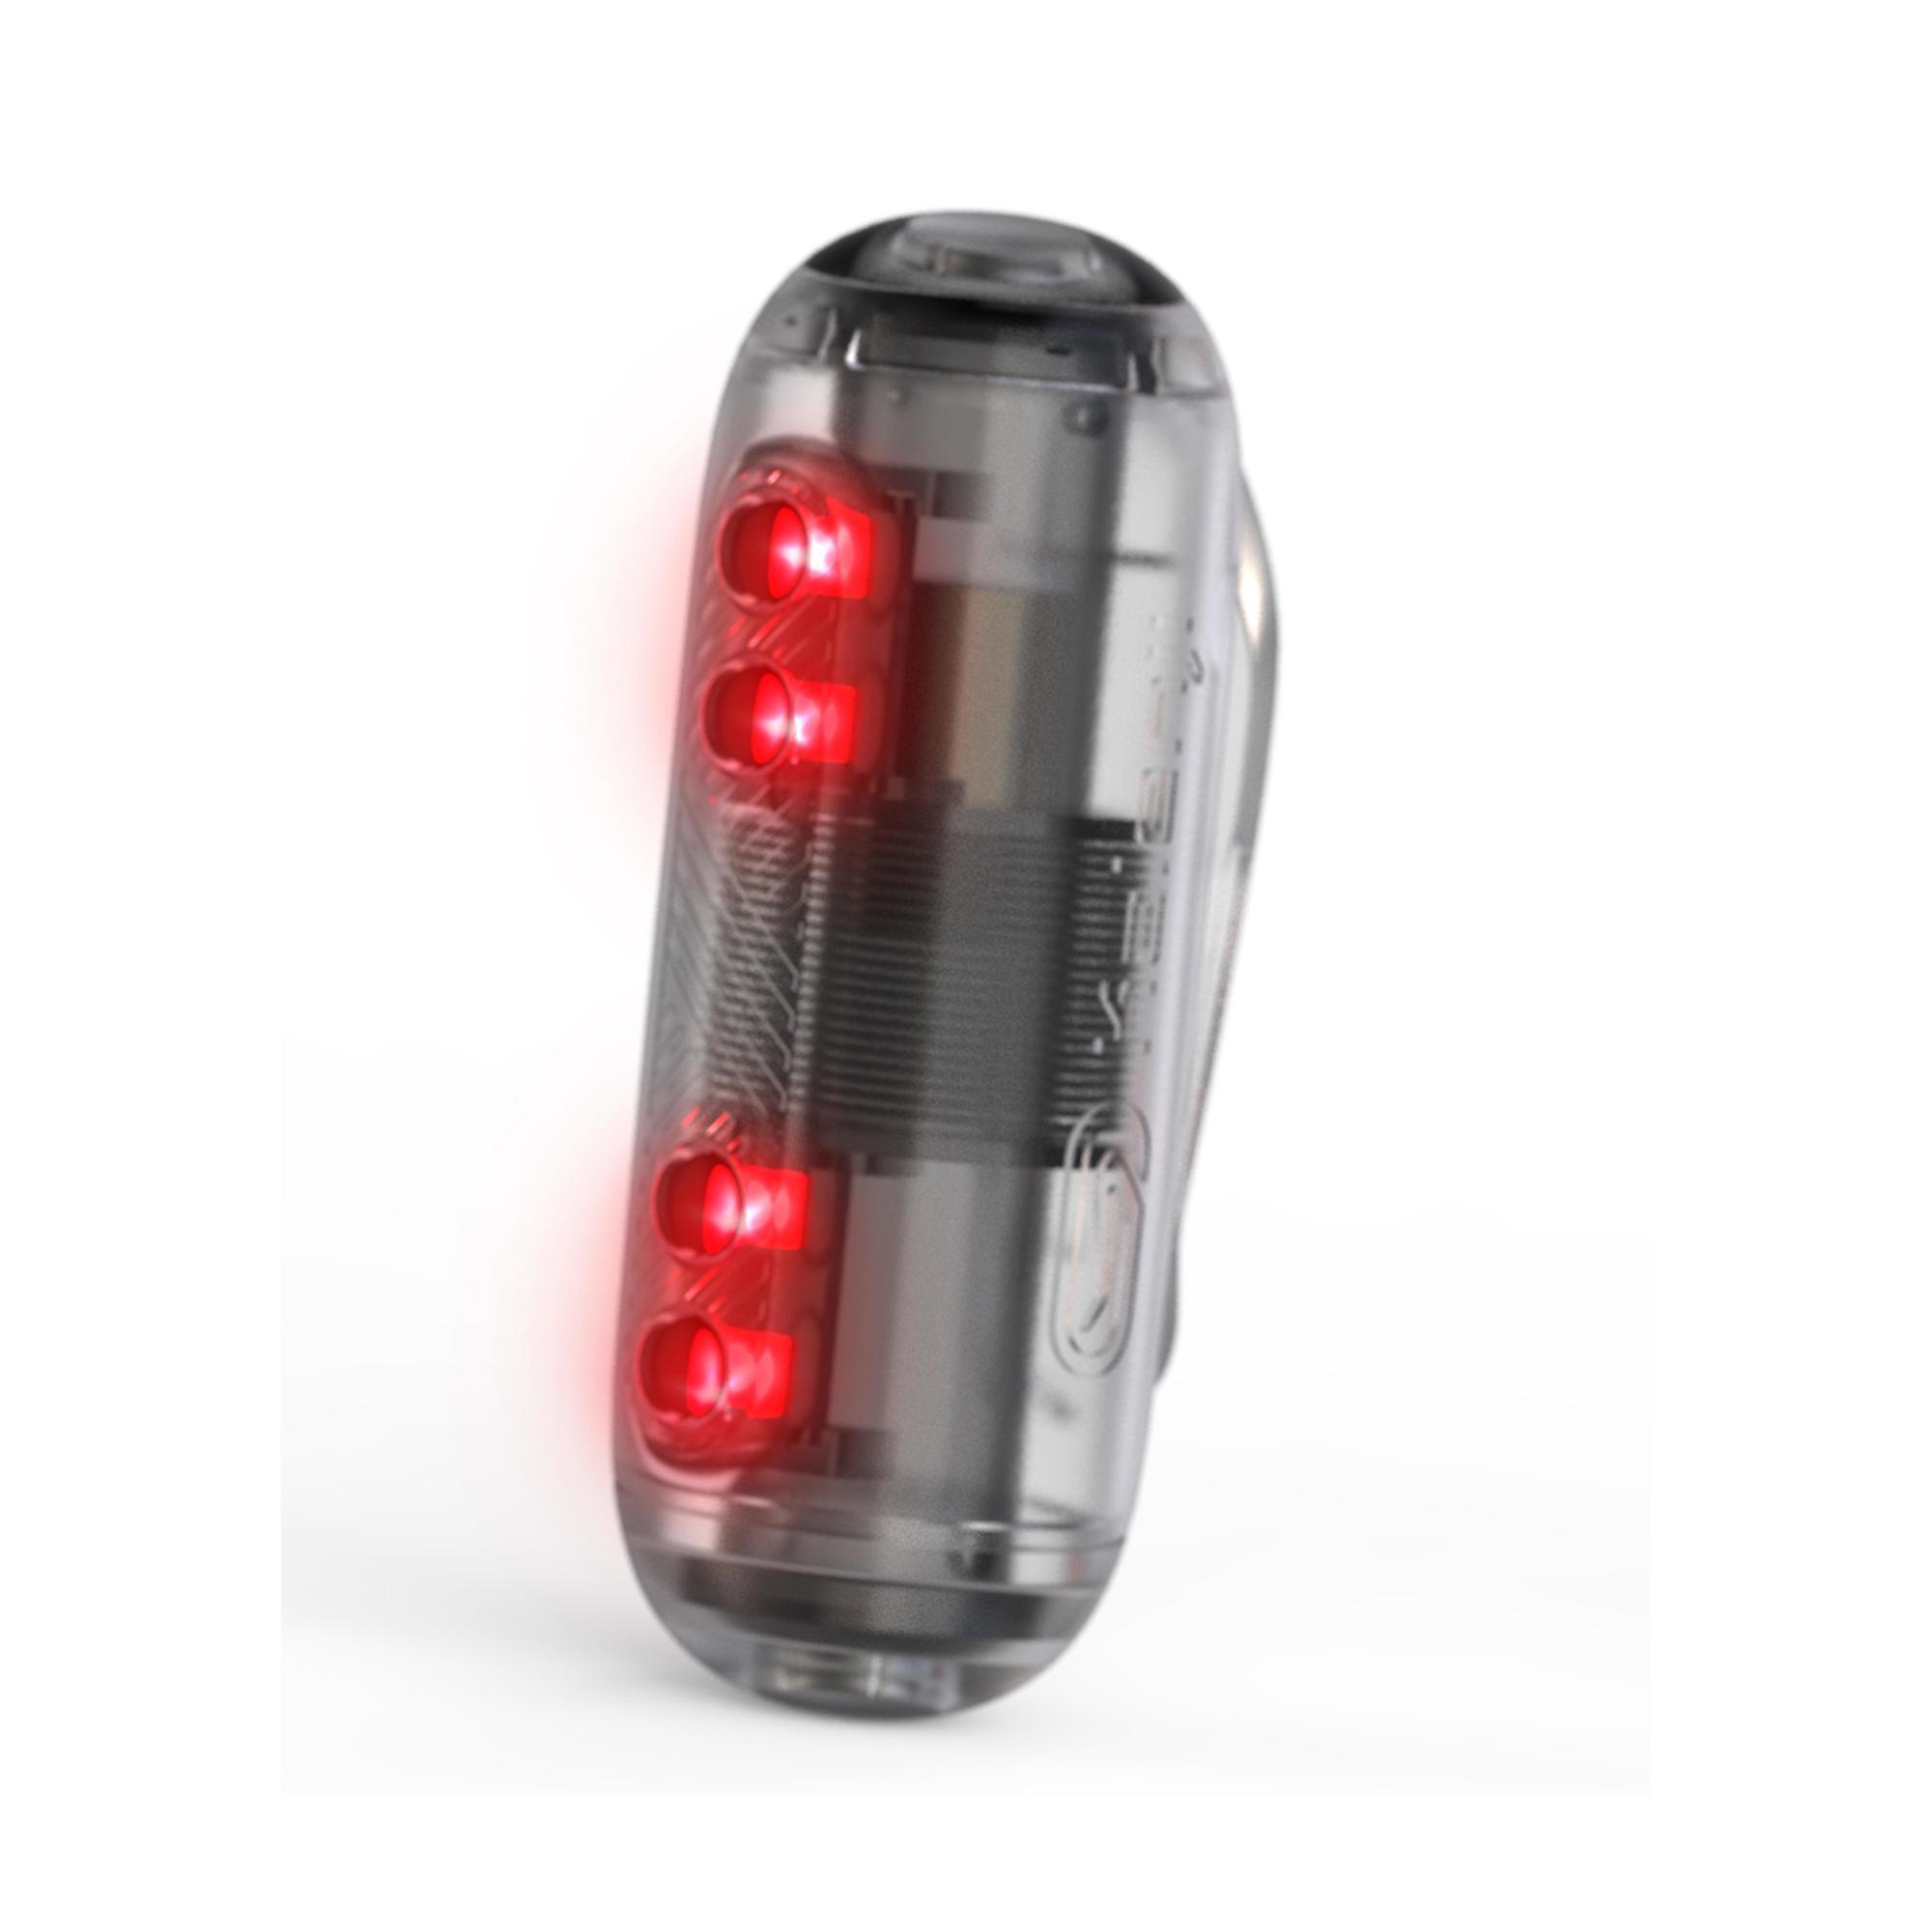 Kalenji Knipperlicht voor hardlopen Motion Light zonder batterij